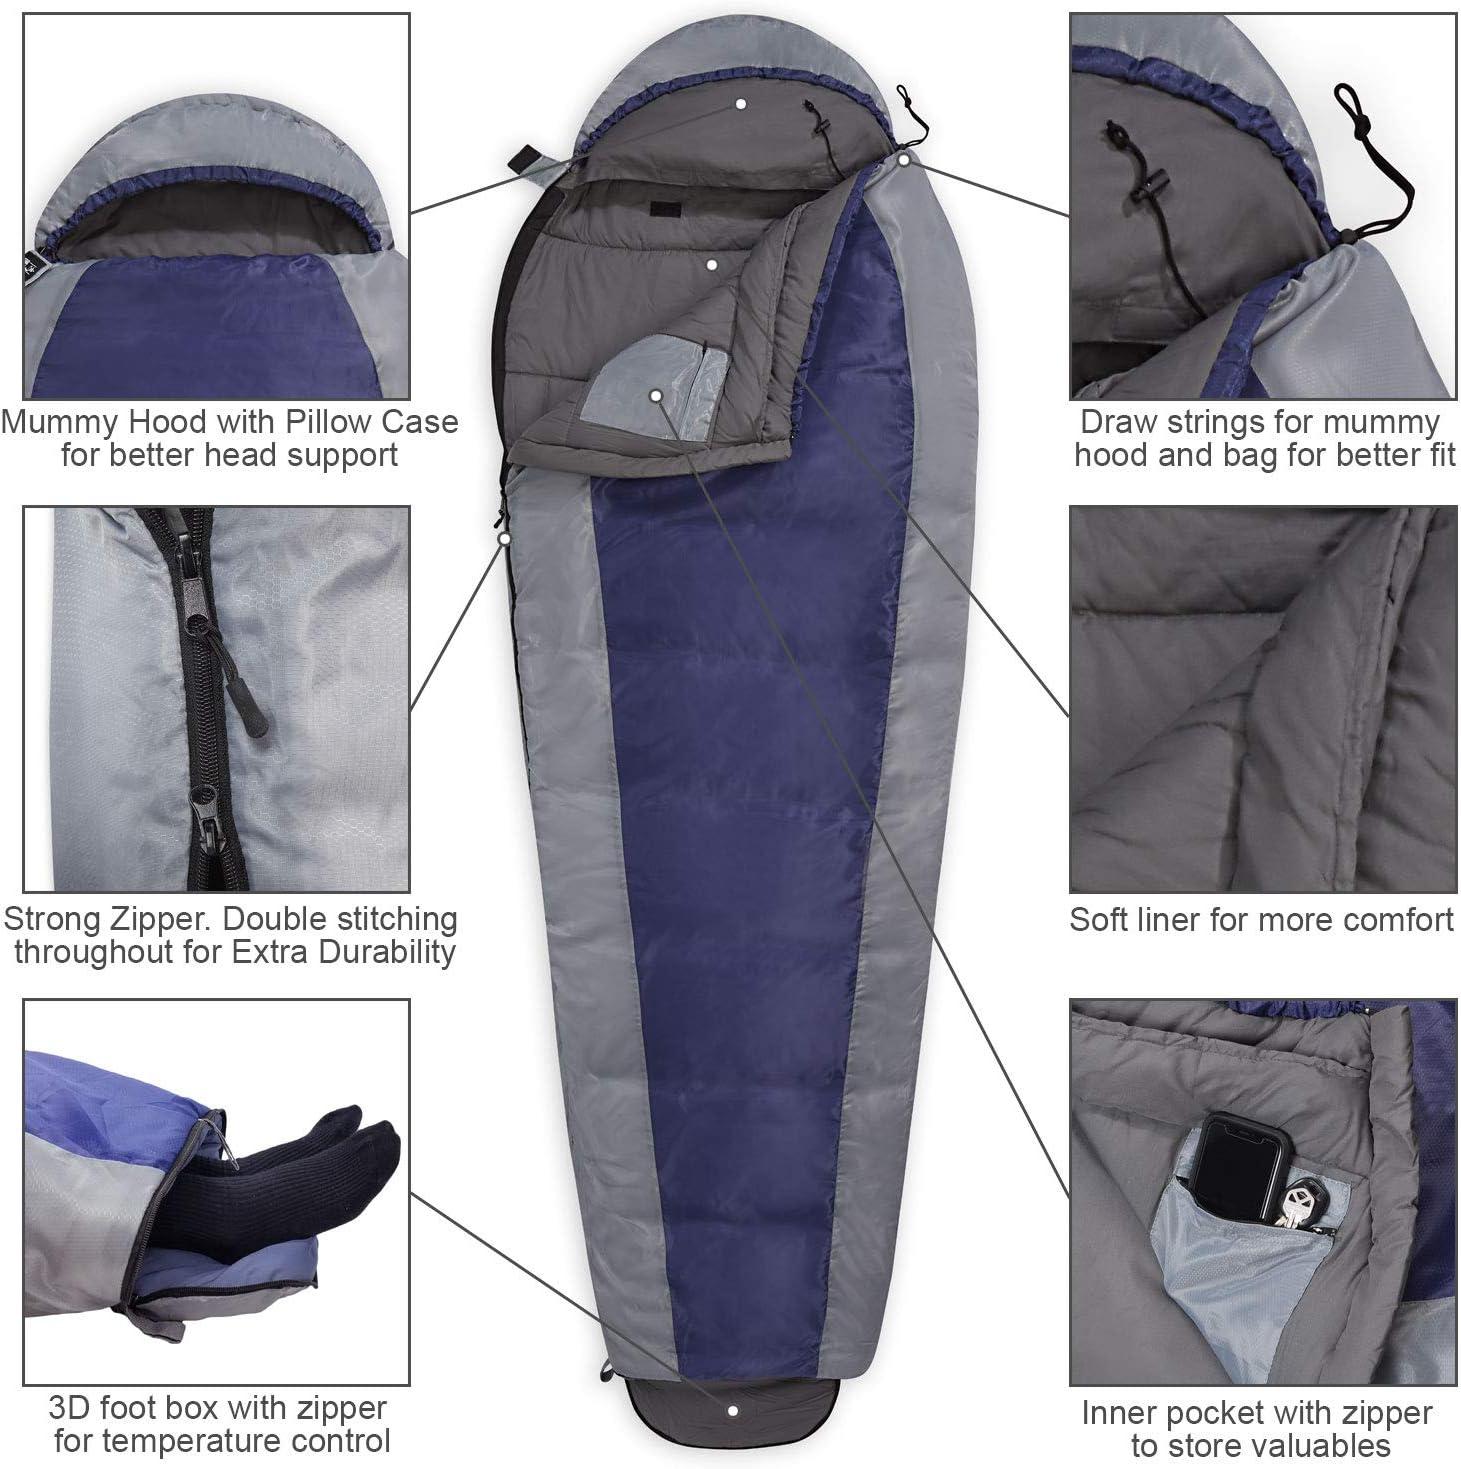 Mummy Sleeping Bag Camping Hiking 4 Season Envelope Single Waterproof Suit Case